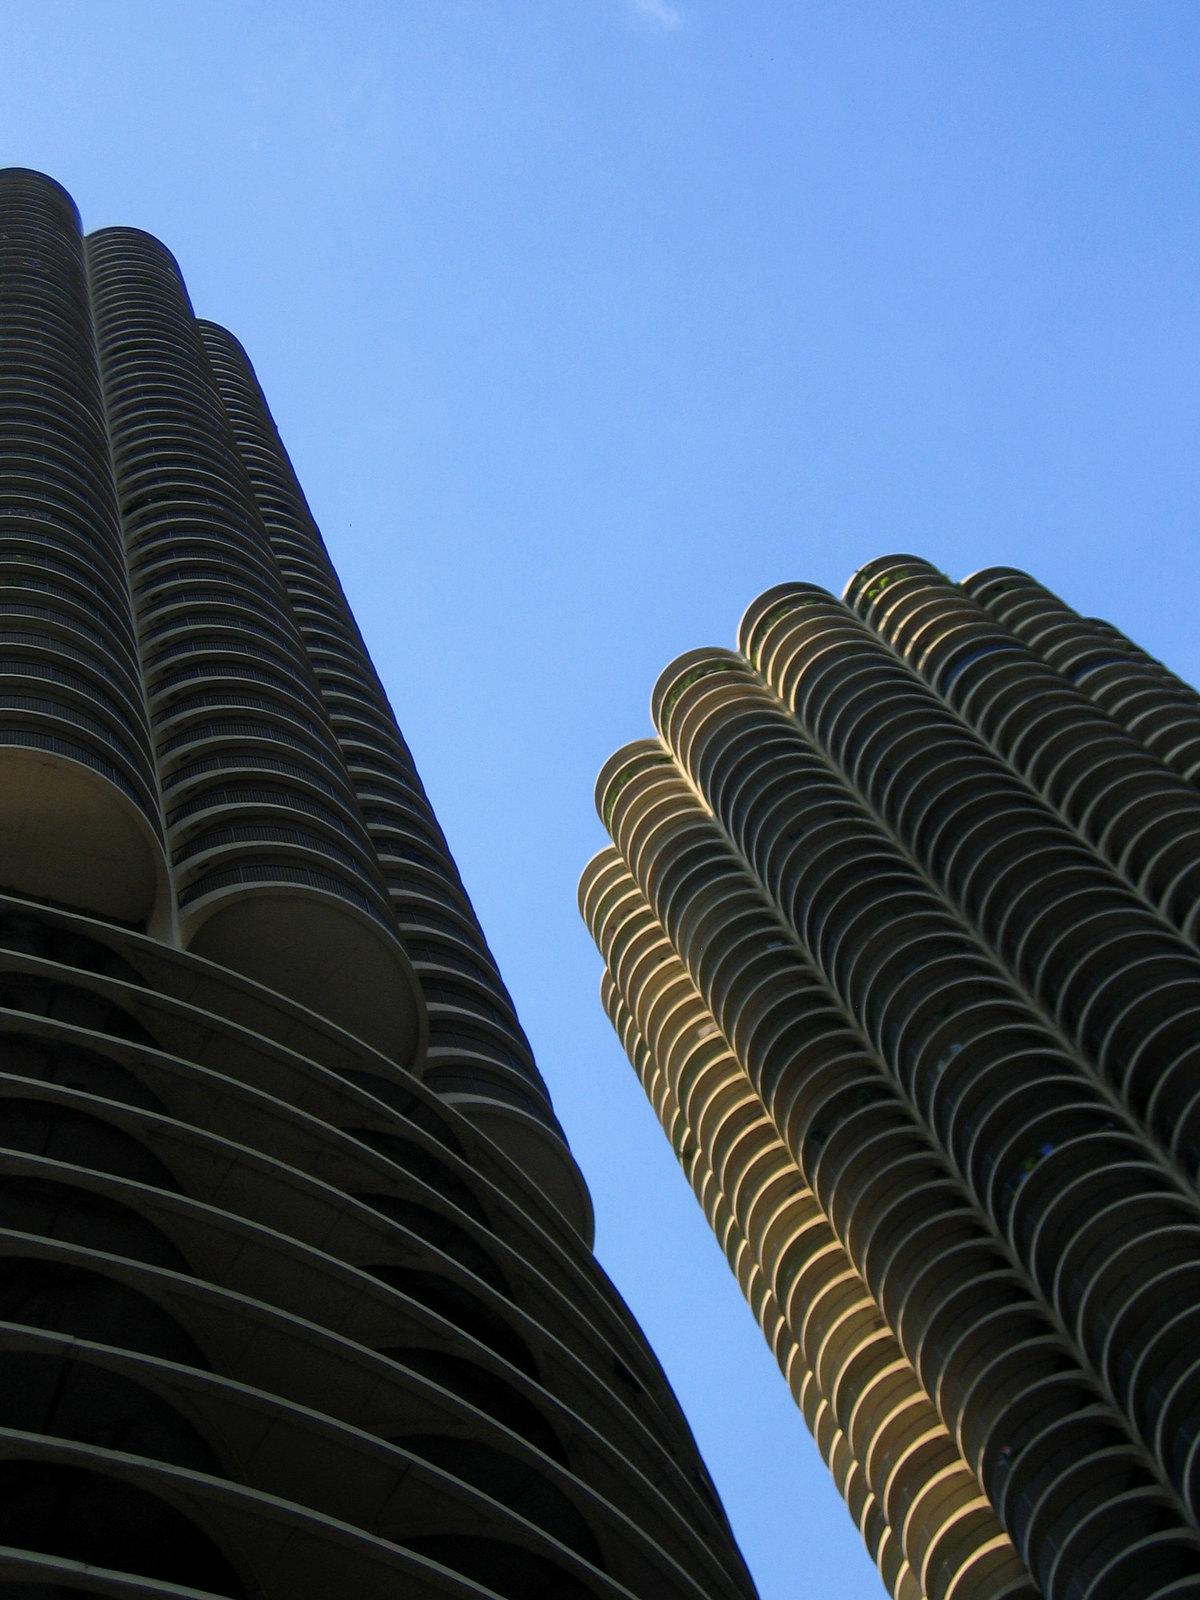 Chicago 0230